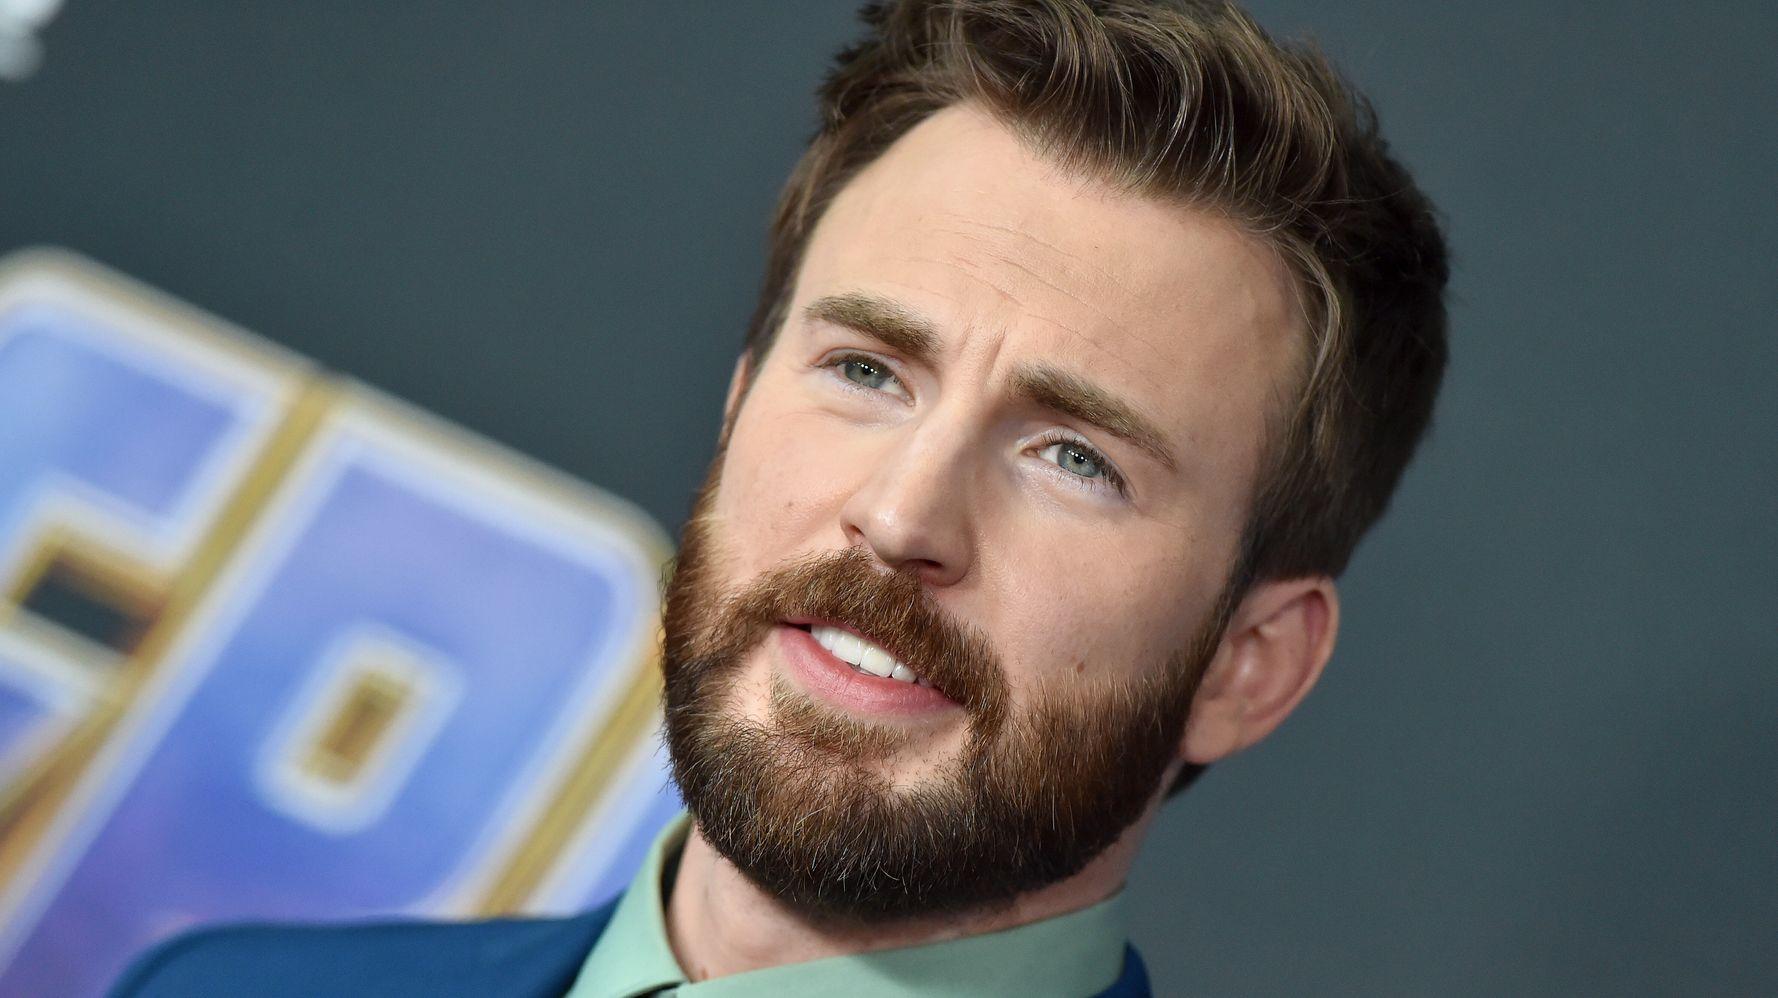 Chris Evans Goes All Captain America On Trump During Biden Fundraiser